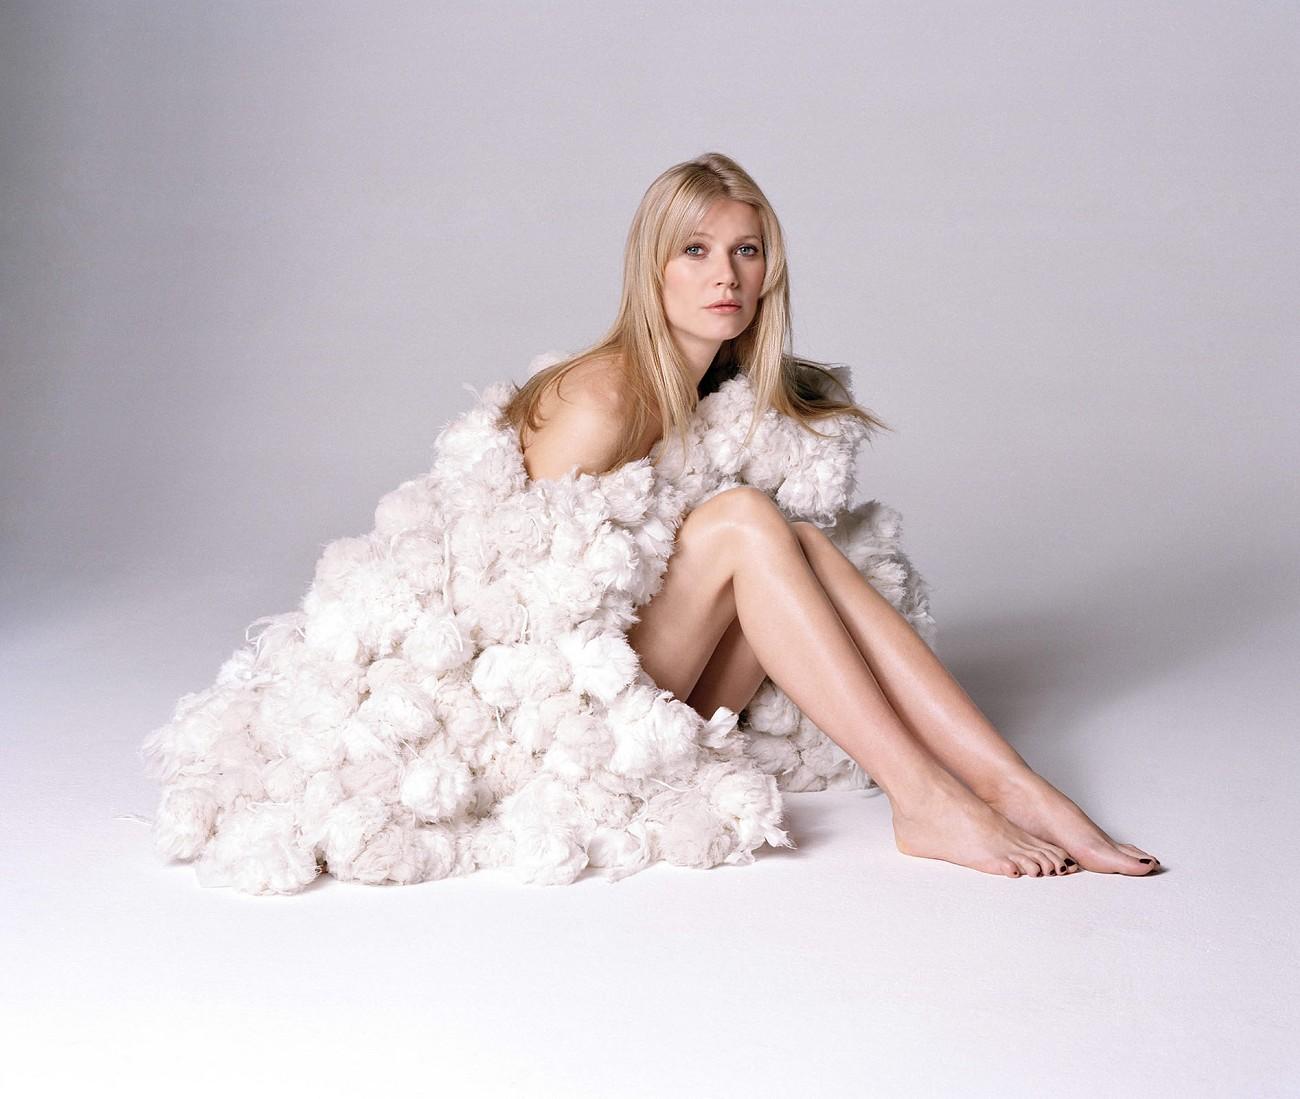 http://3.bp.blogspot.com/-Ygc4pYRFubM/Ts_RmrEYctI/AAAAAAAAC0M/1vsdN8t3Z5o/s1600/gwyneth-paltrow-02.jpg